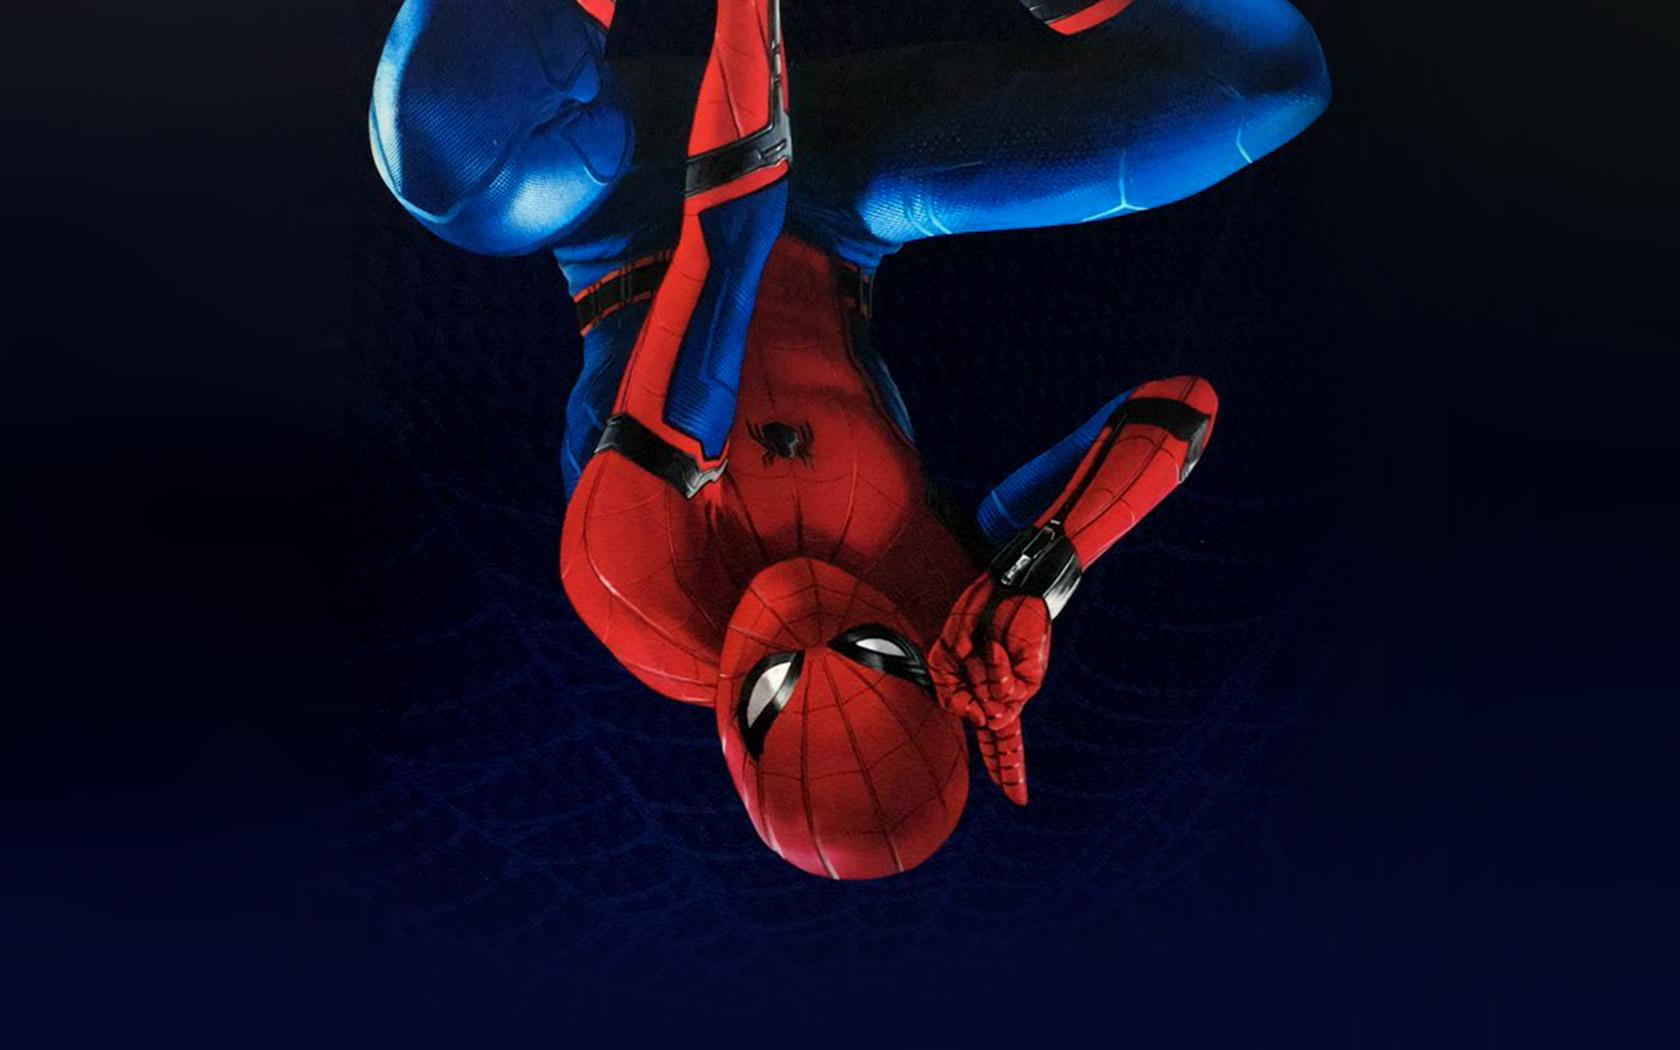 wallpaper for desktop, laptop | az61-spiderman-homecoming ...